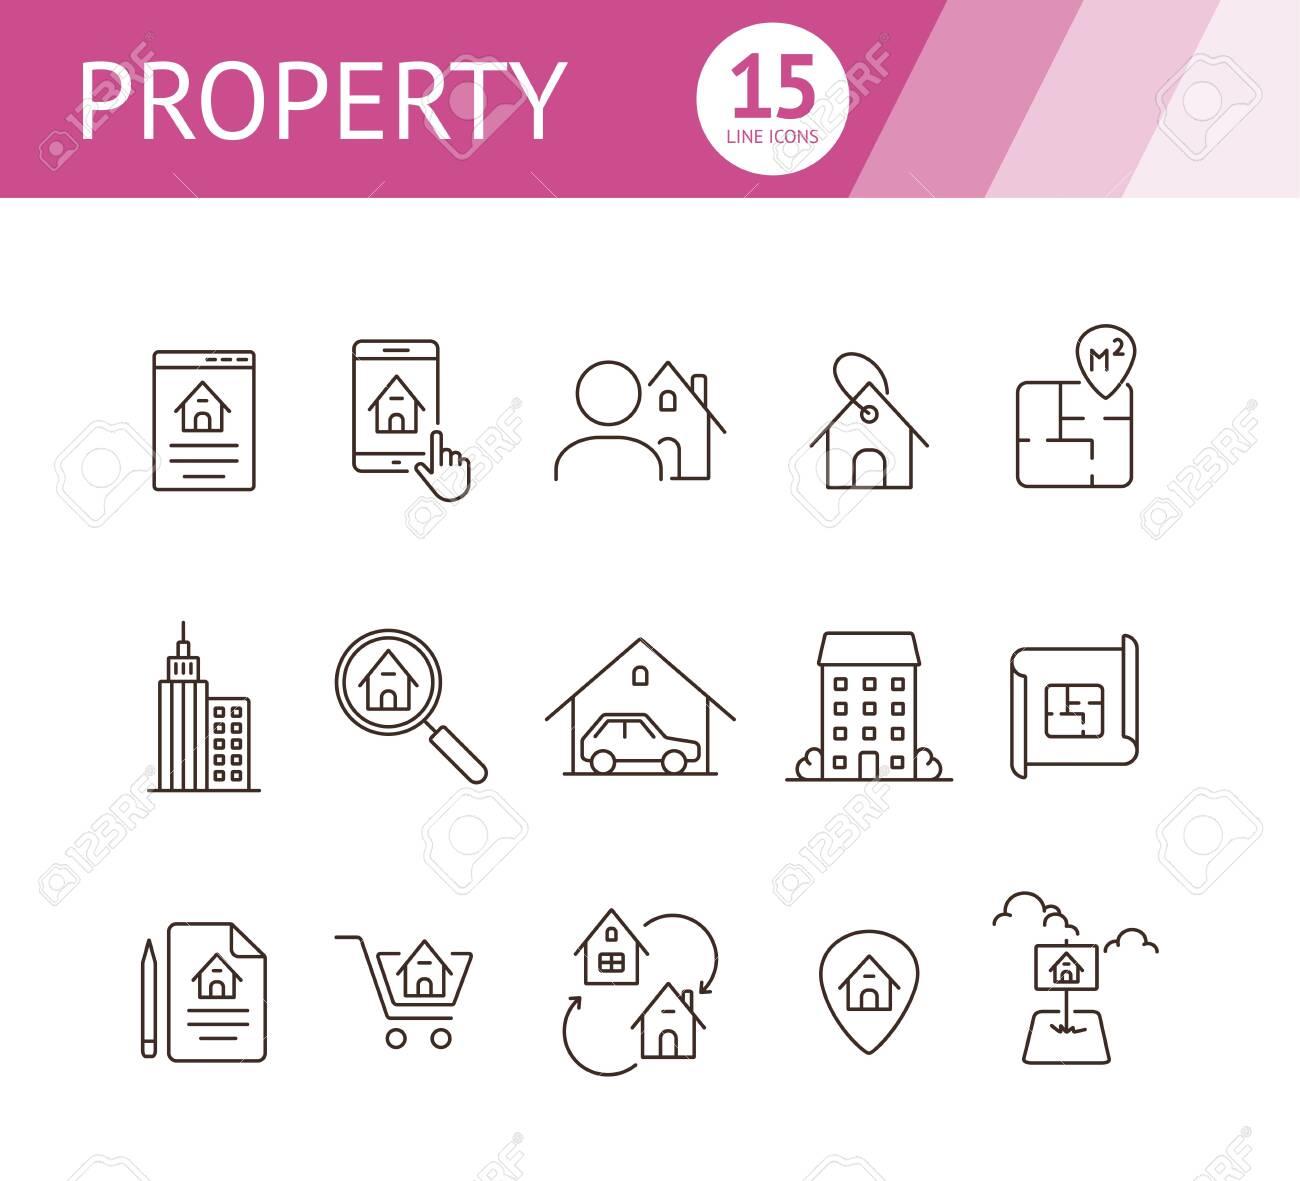 Property line icon set. House, garage, apartment, floor plan...